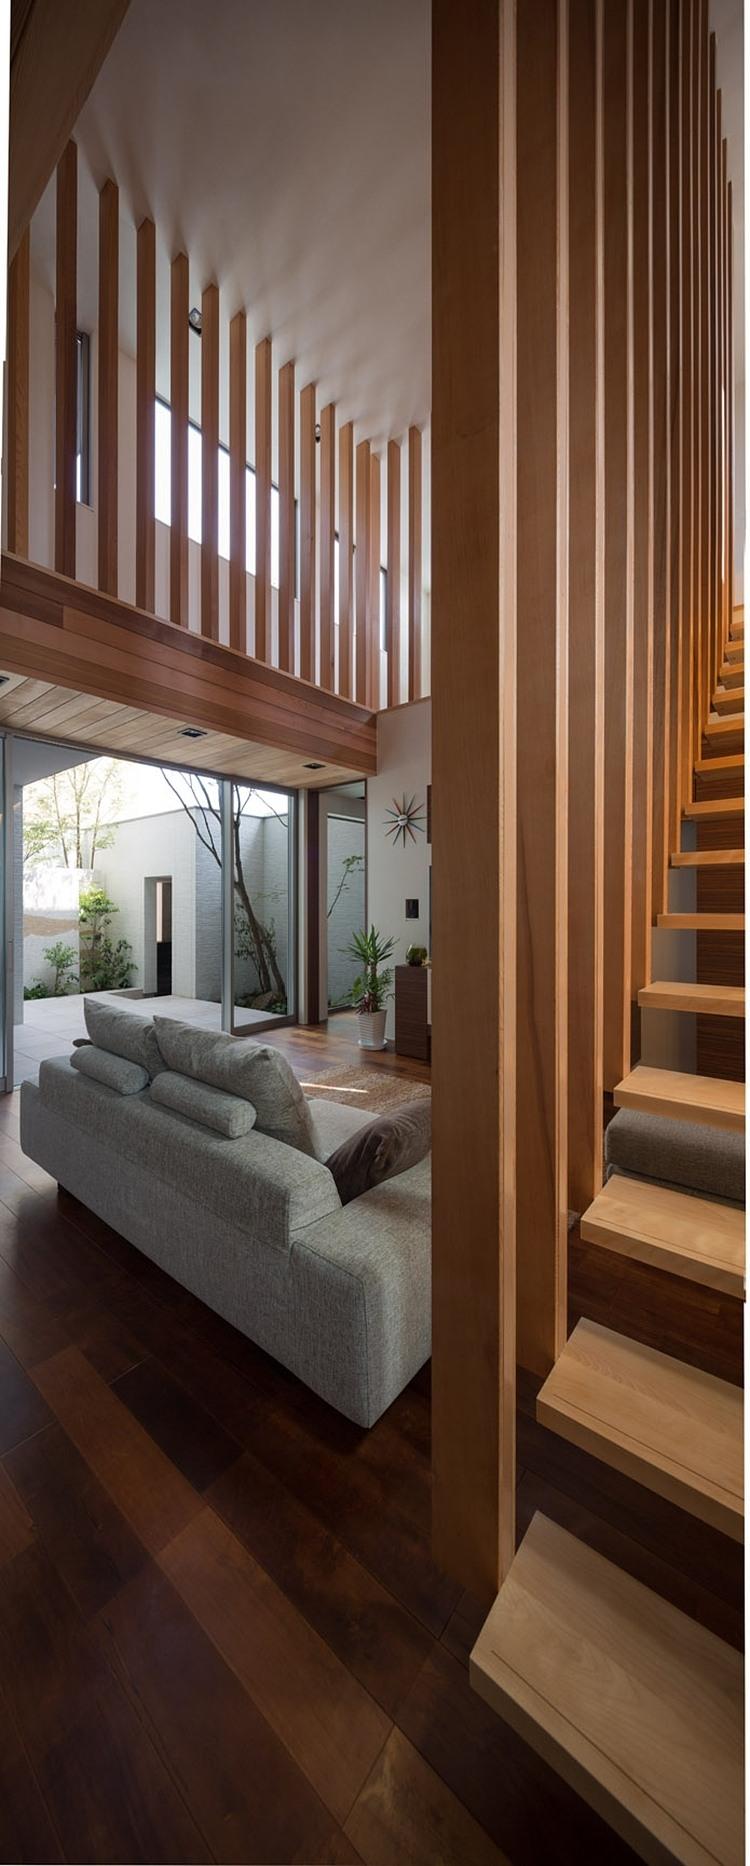 009-m4house-architect-show